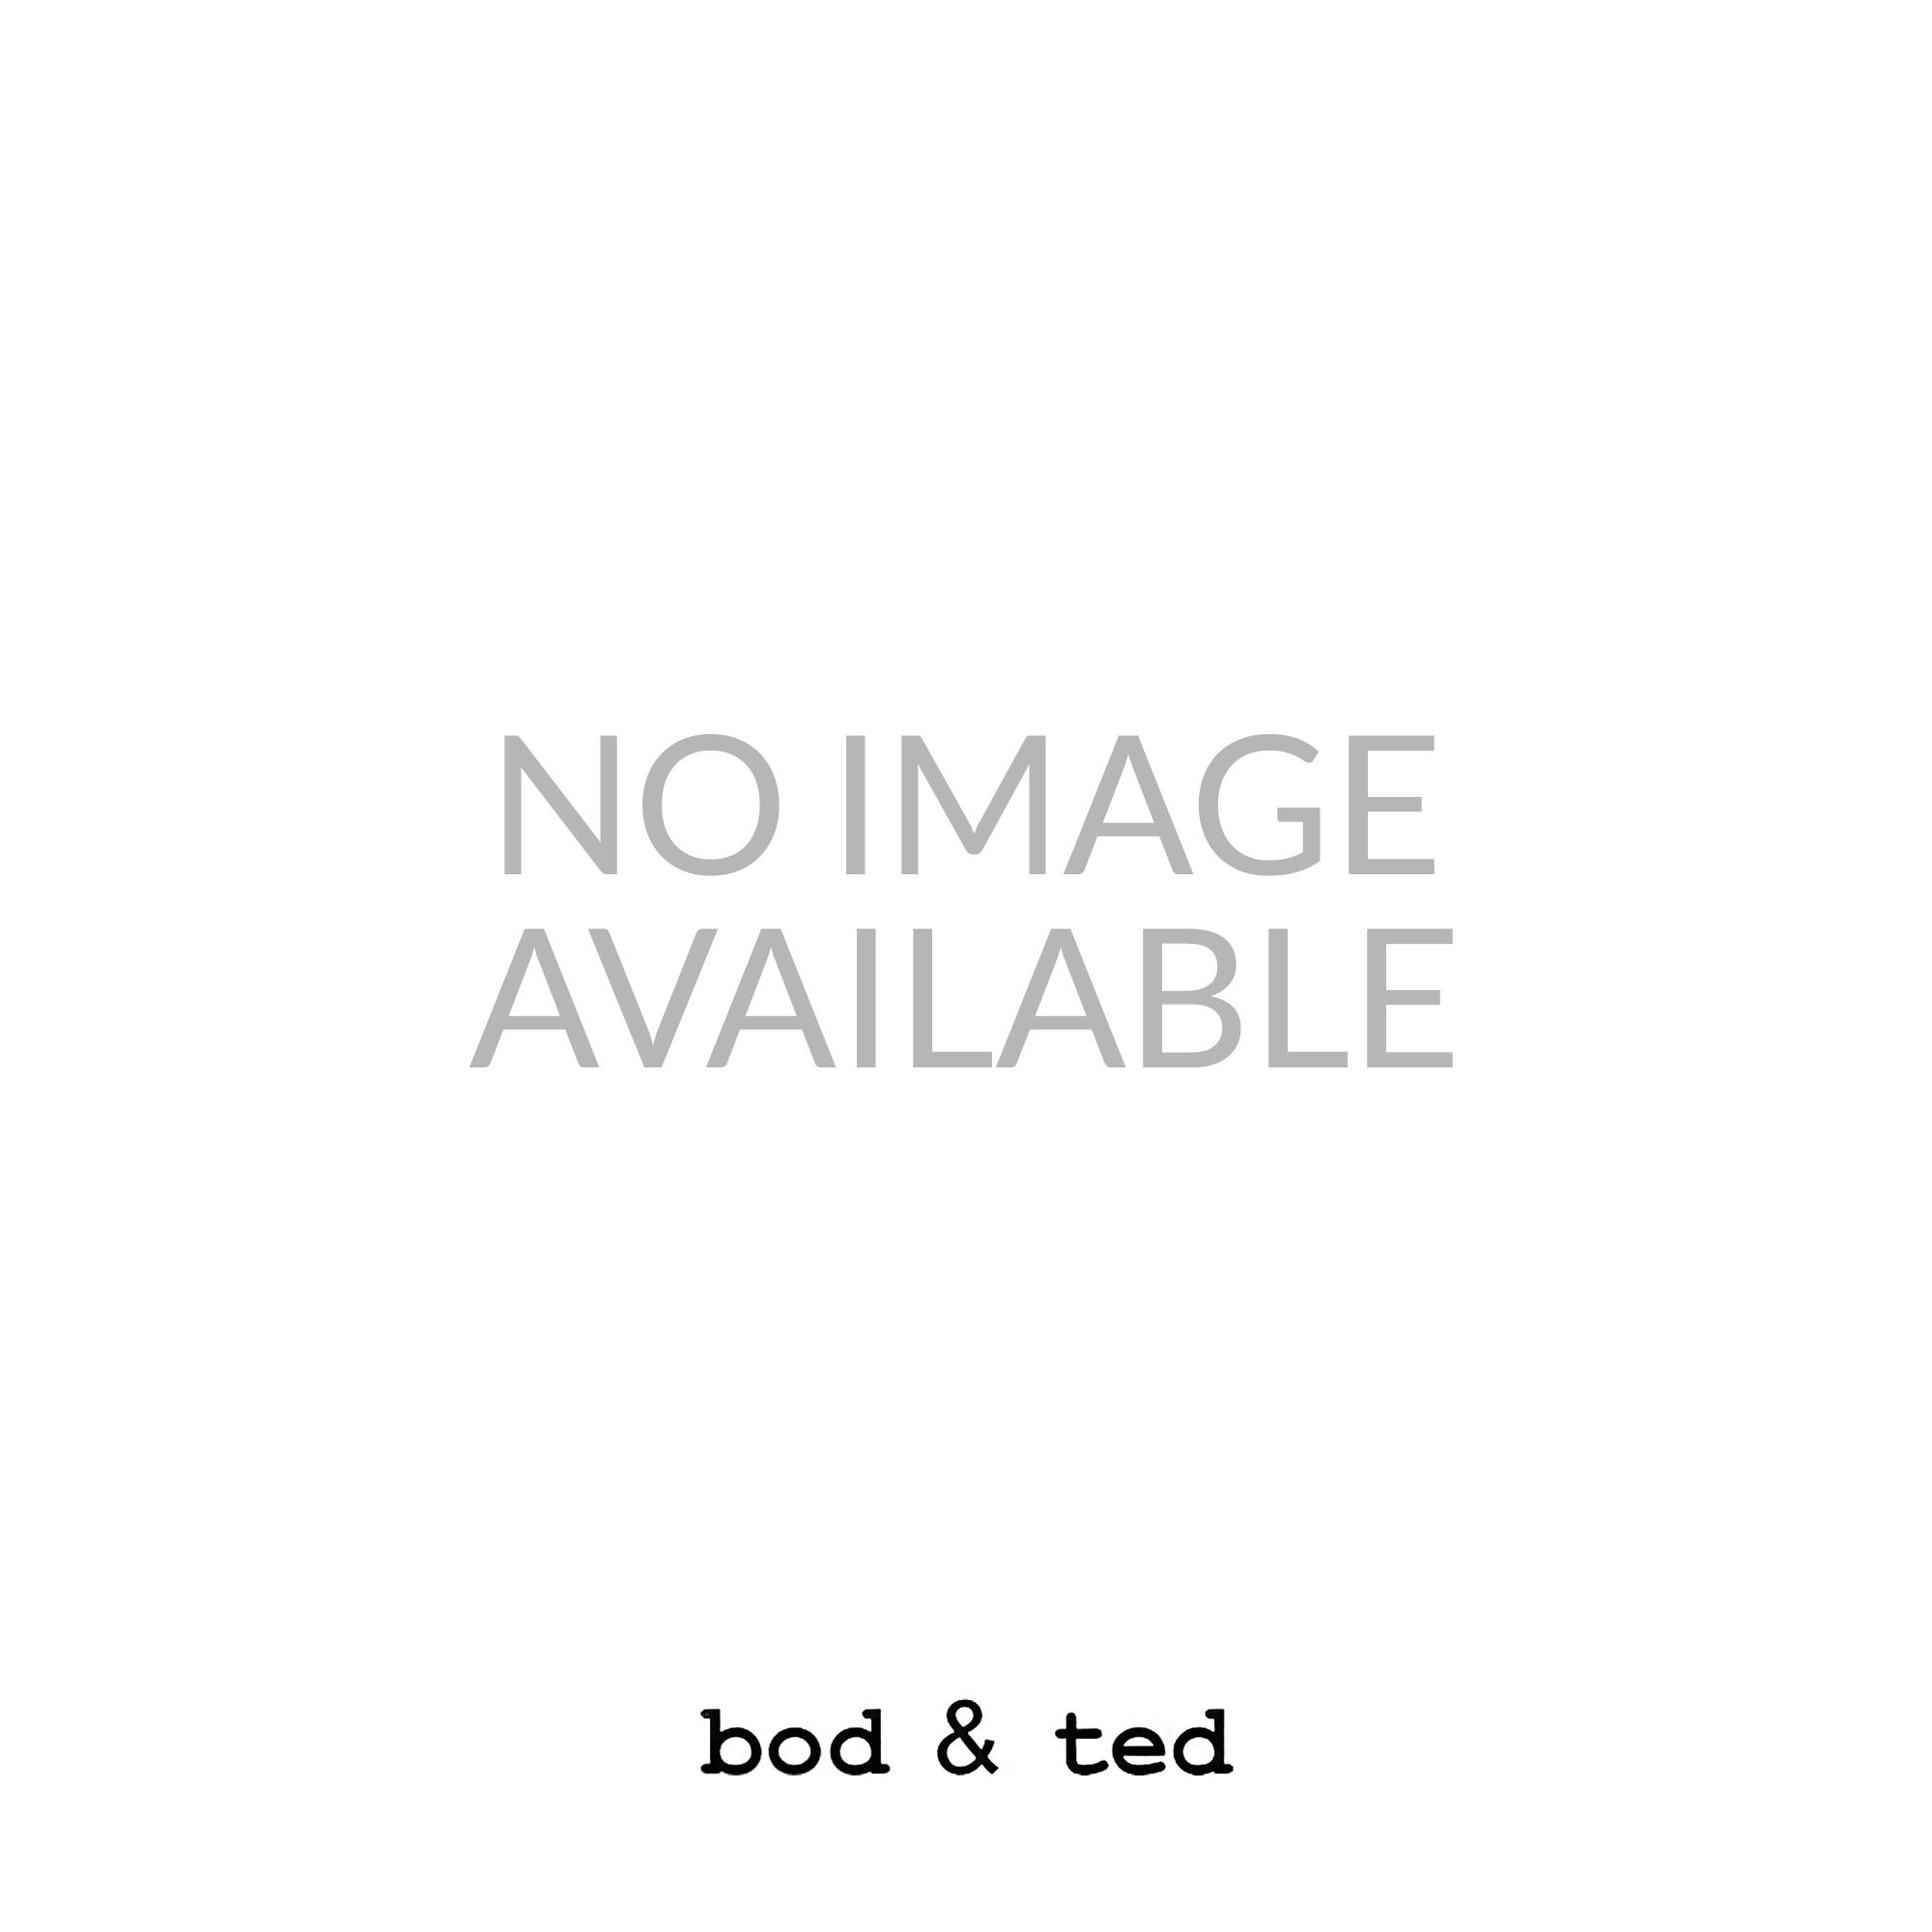 360 Sweater Matea Cotton Slub Stripe Top in Light Heather Grey